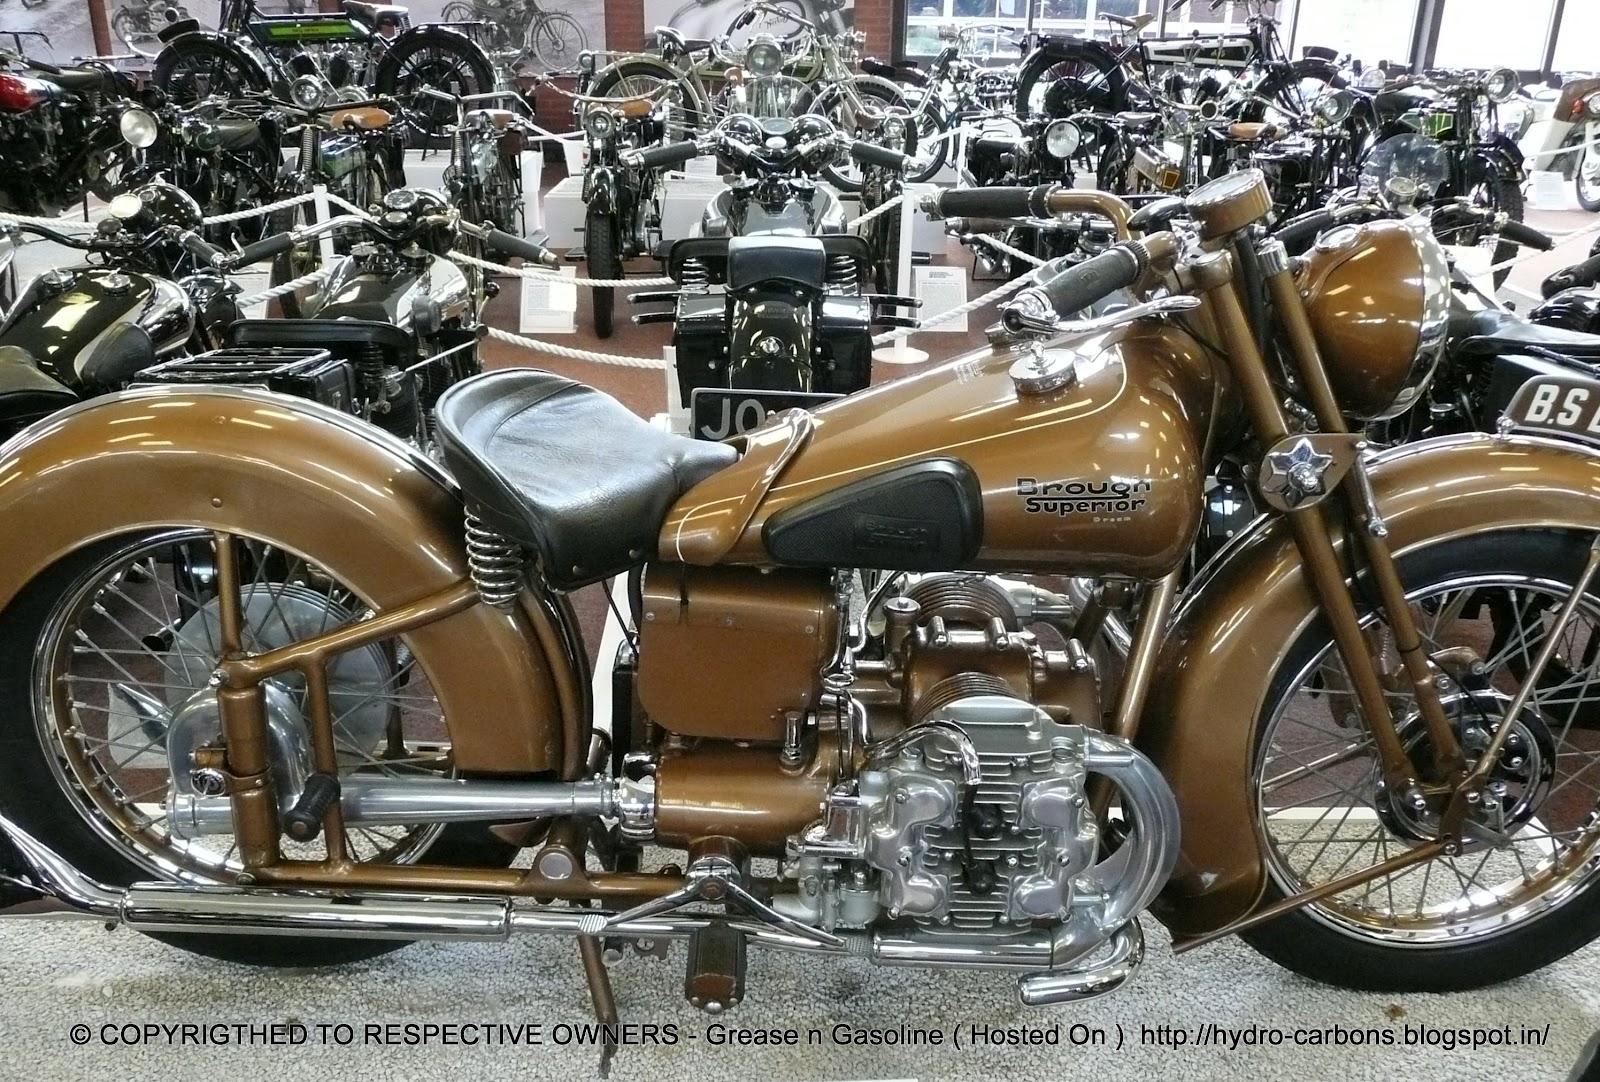 Brough Superior Grease N Gasoline